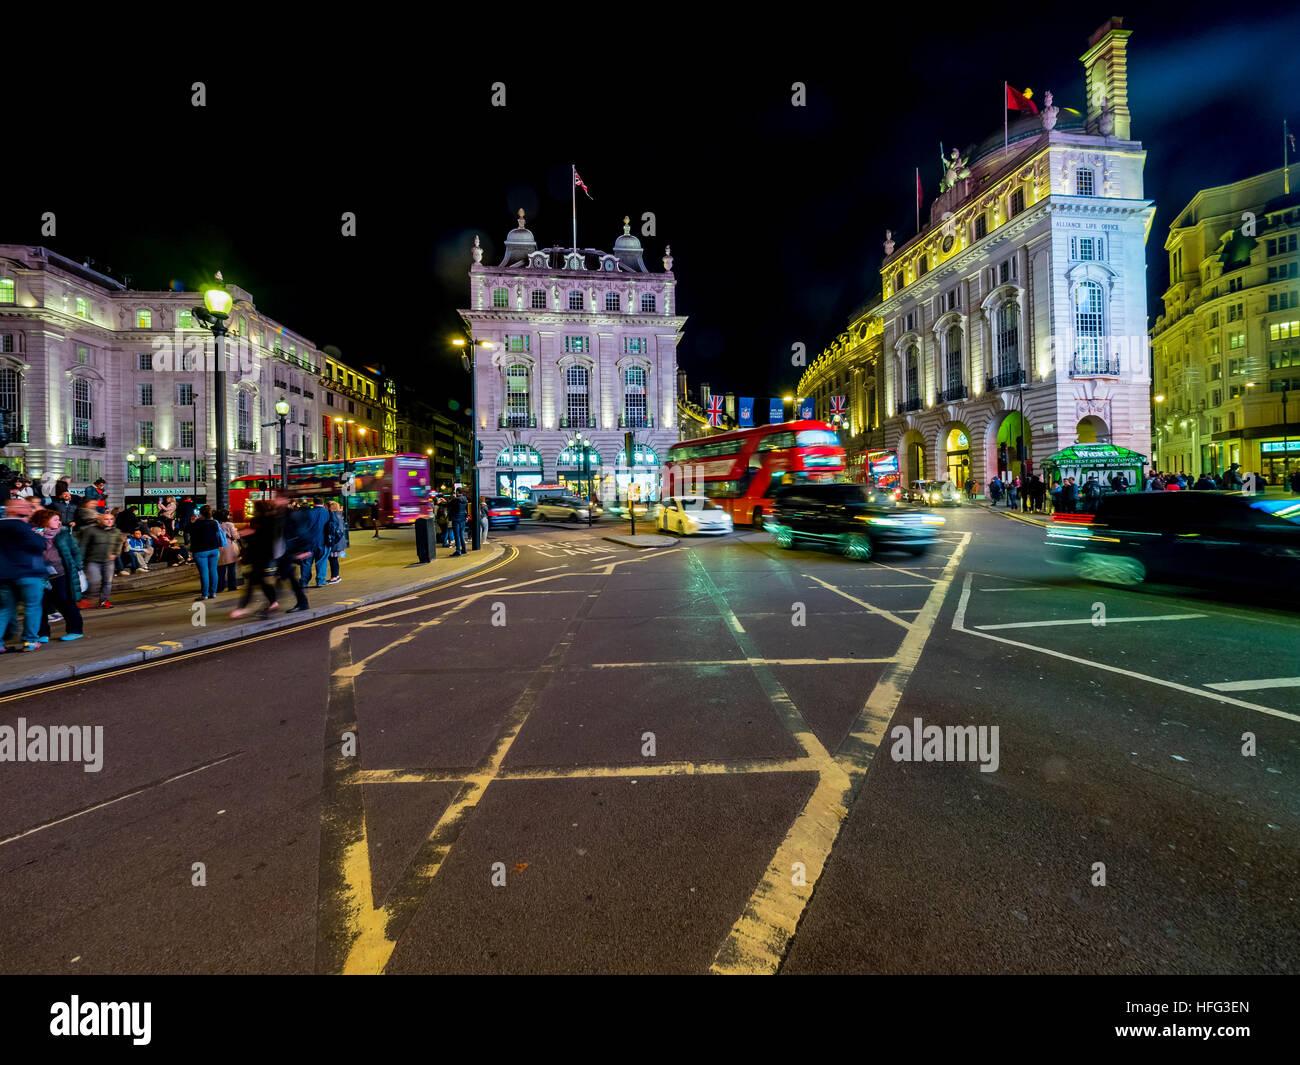 Tráfico, Piccadilly Circus, la noche, Londres, Inglaterra, Reino Unido Imagen De Stock